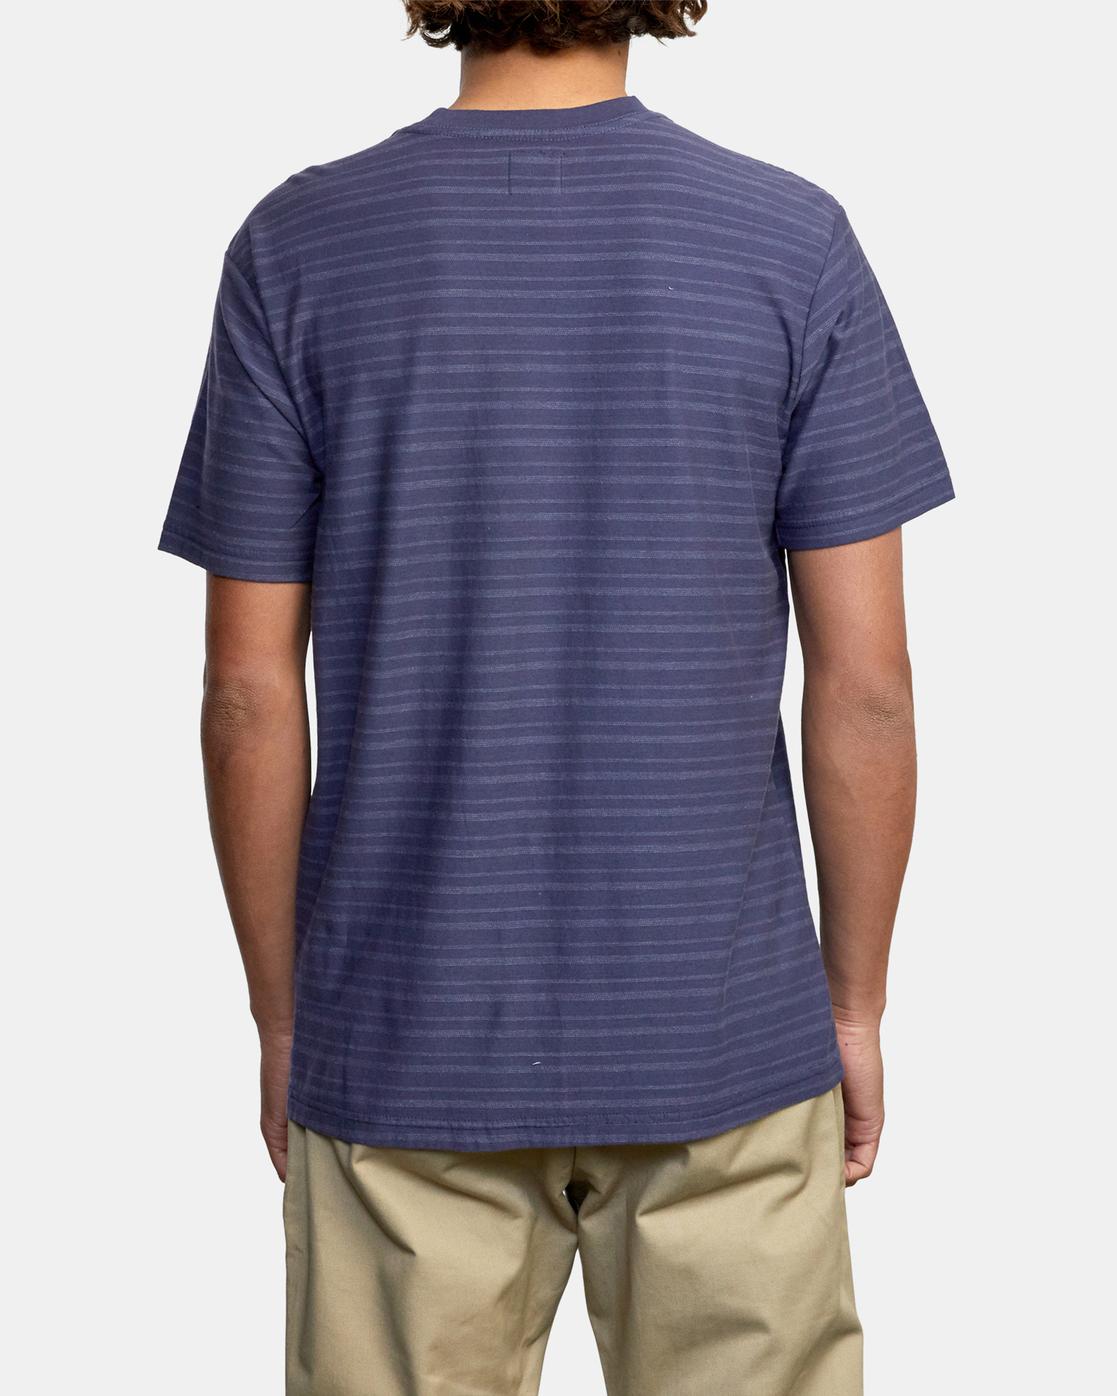 2 Texture Stripe - T-Shirt for Men  W1KTRDRVP1 RVCA